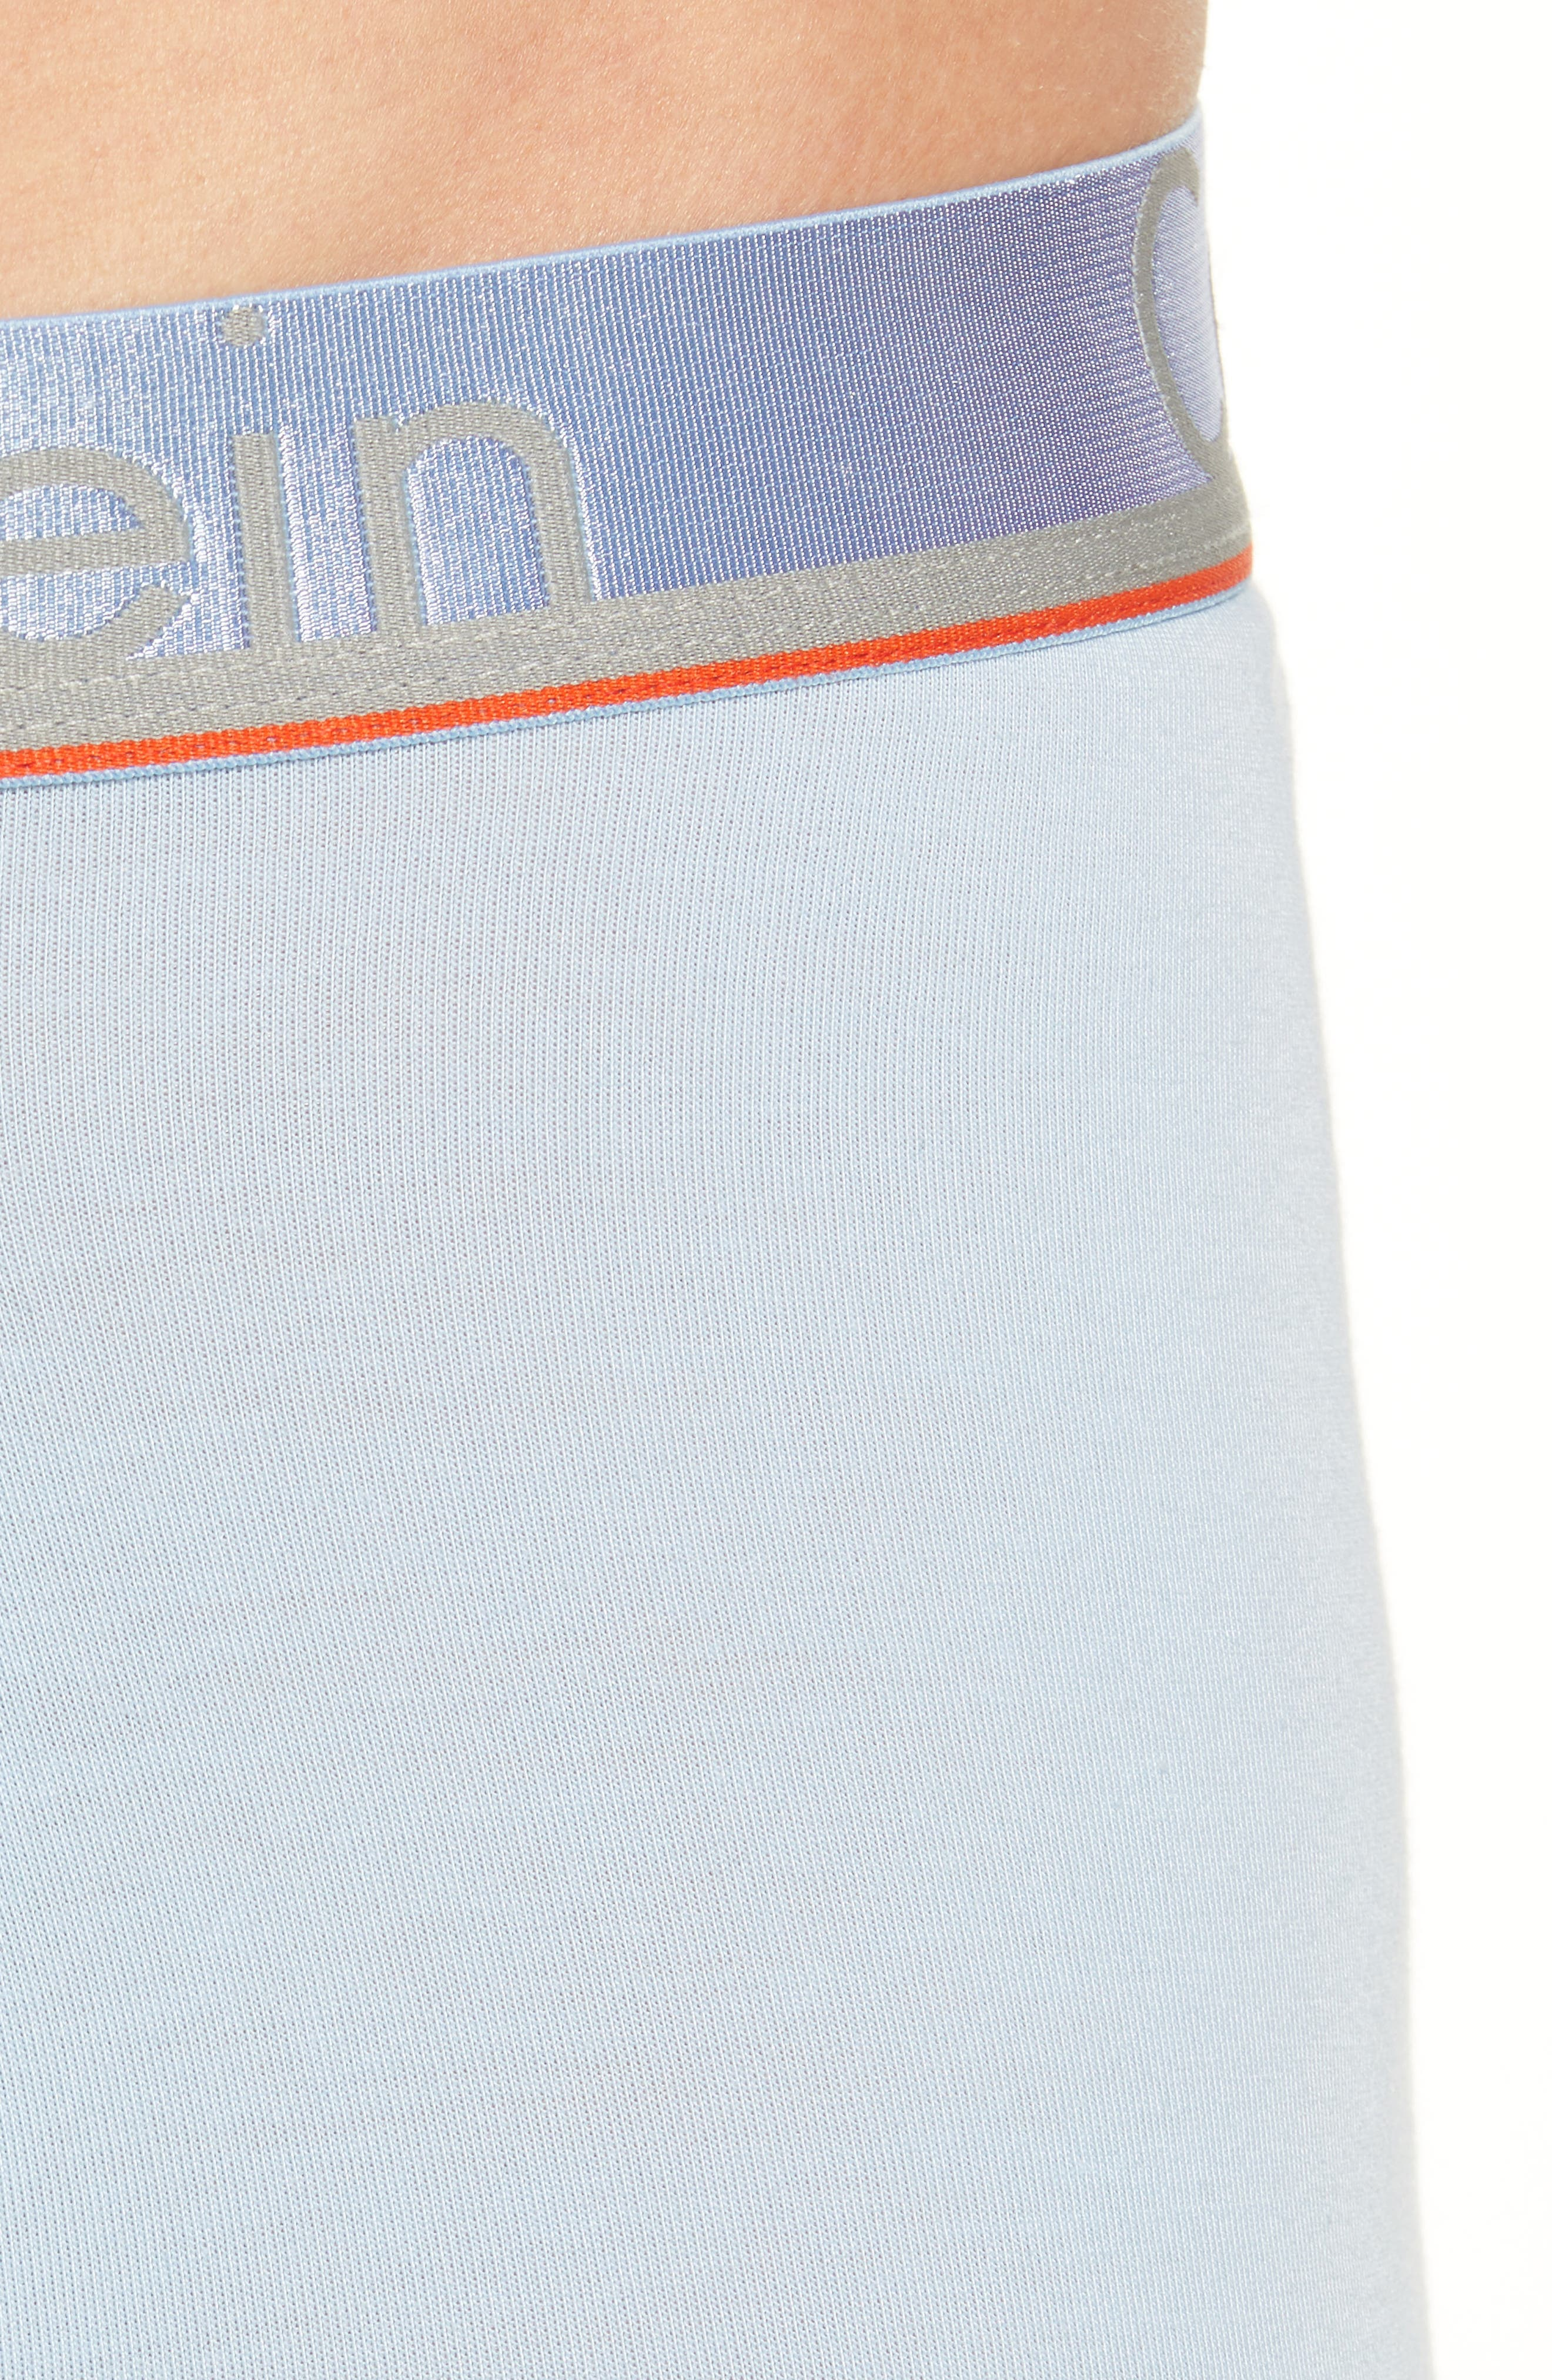 3-Pack Comfort Microfiber Boxer Briefs,                             Alternate thumbnail 53, color,